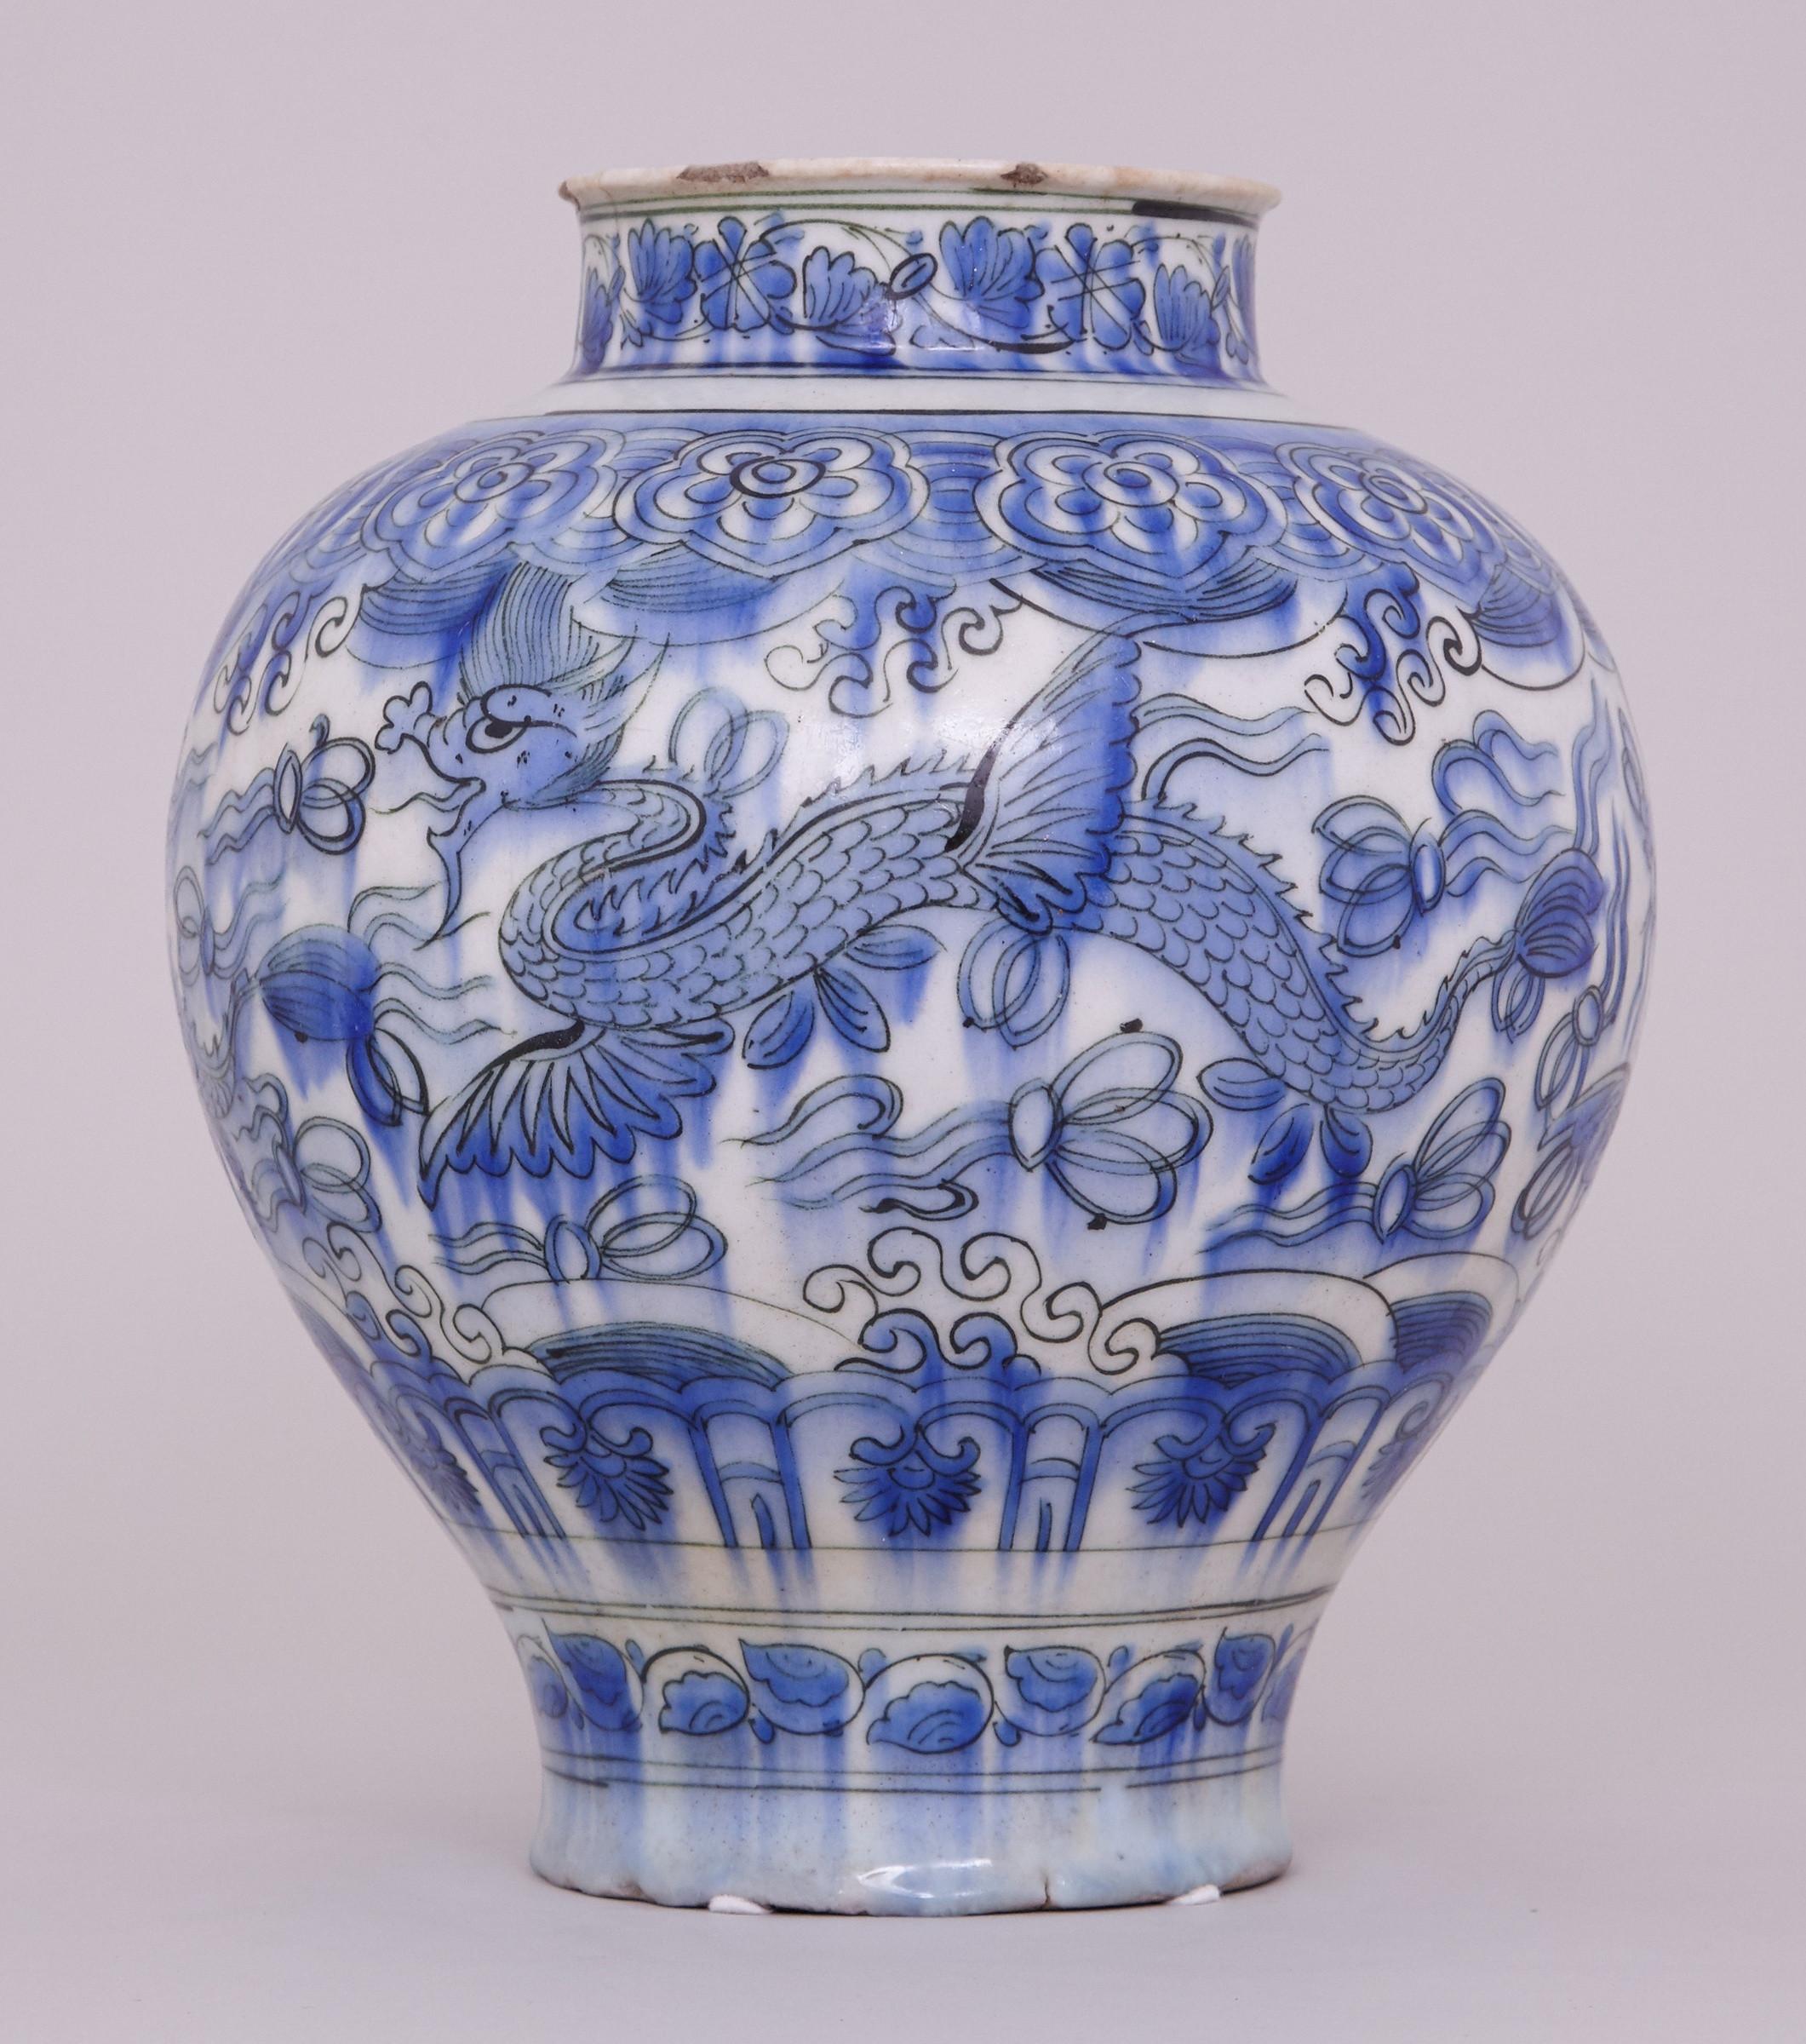 28 Unique 17th Century Chinese Vase 2021 free download 17th century chinese vase of a blue and white persian safavid jar 17th century anita gray within a blue and white persian safavid jar 1